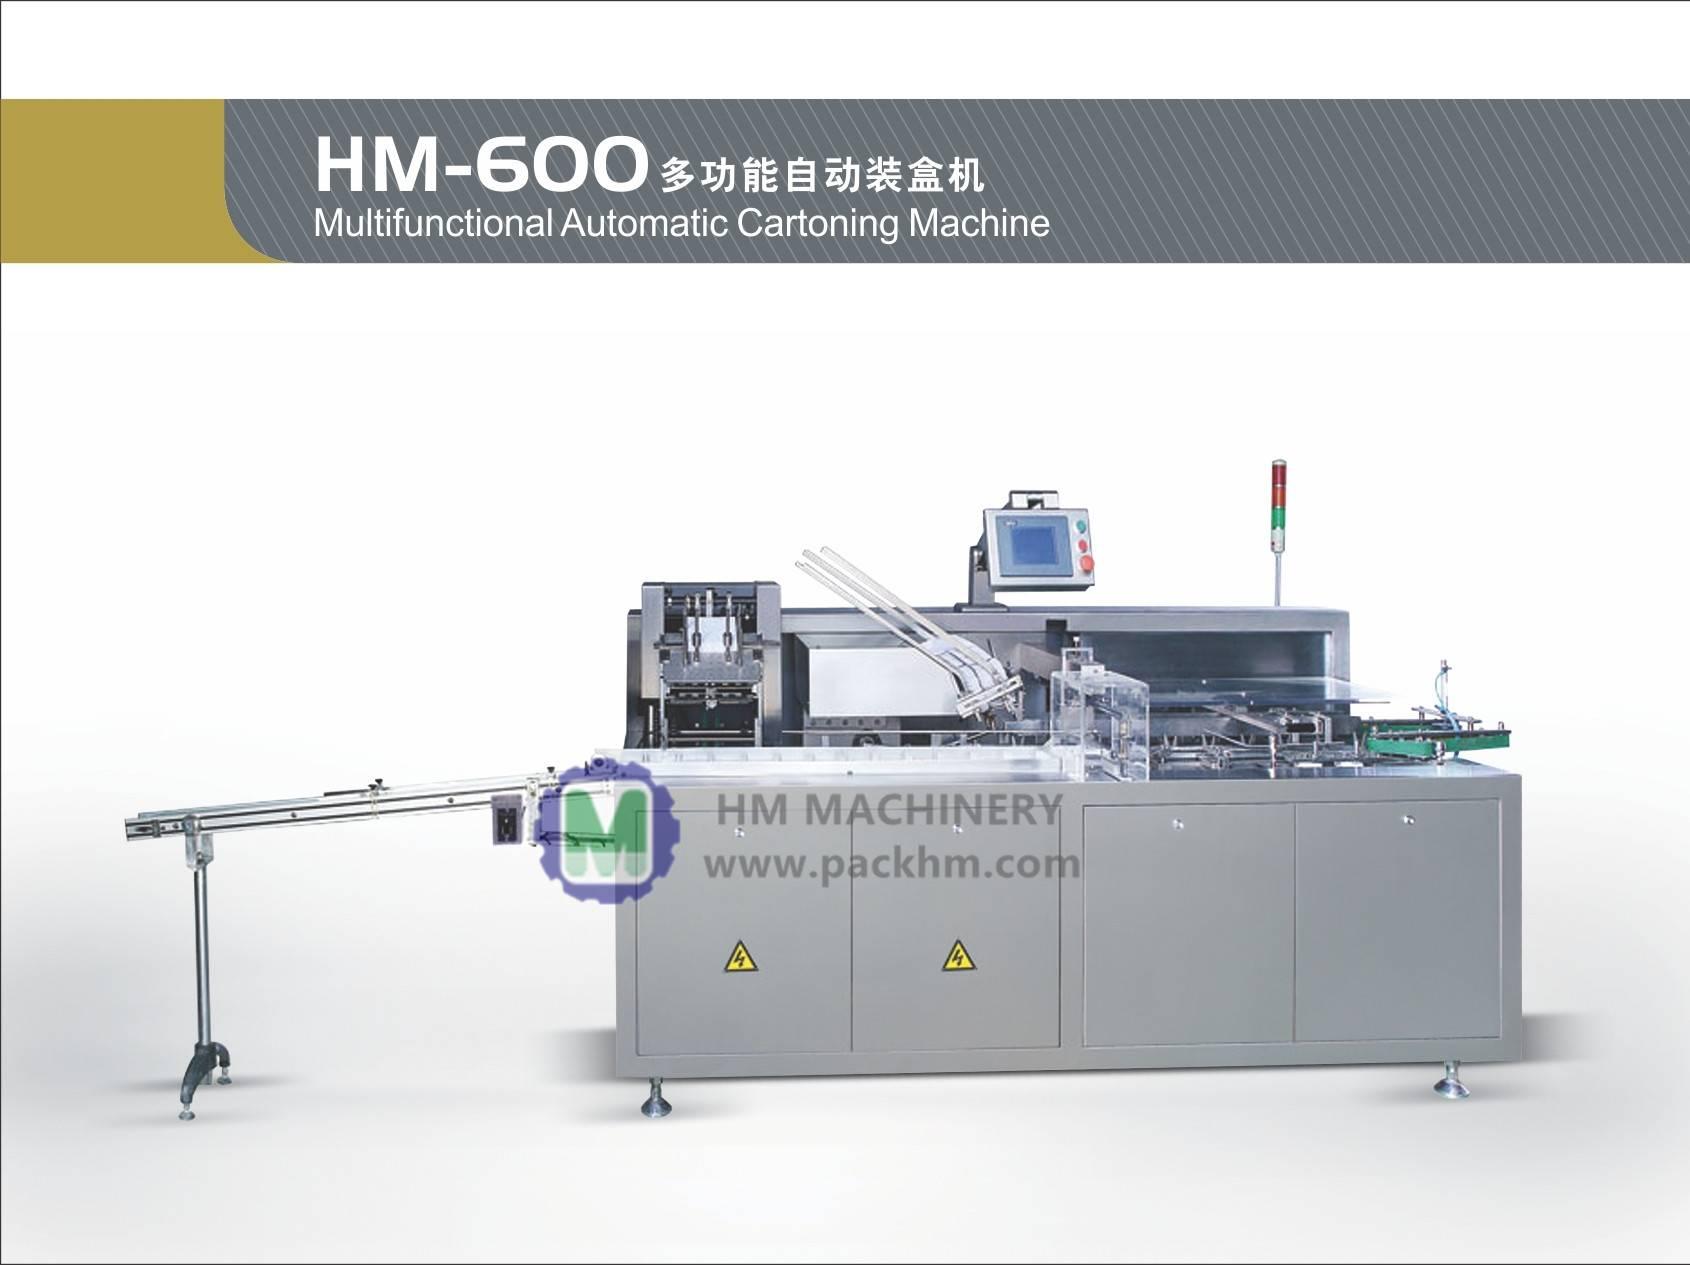 HM600 Multifunctional Automatic Cartoning Machine